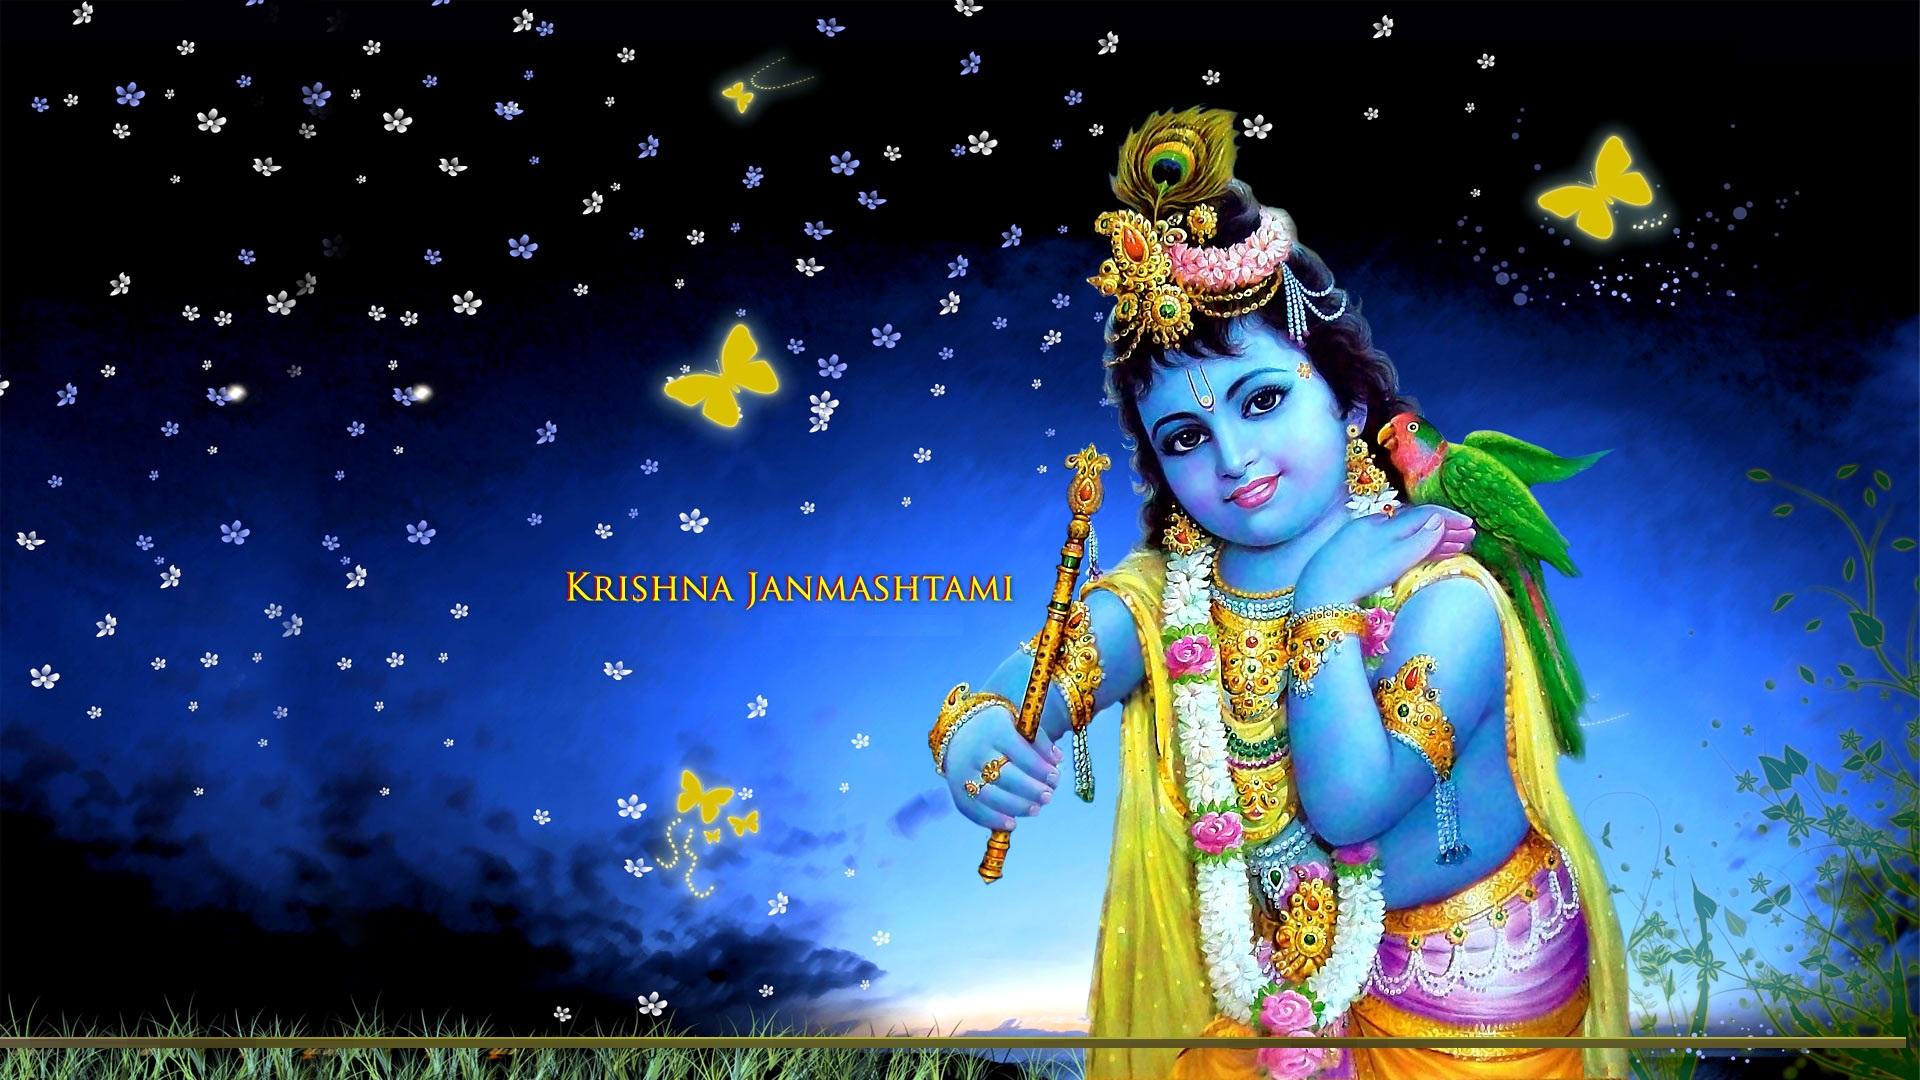 Krishna Janmashthami – Significance & Celebrations